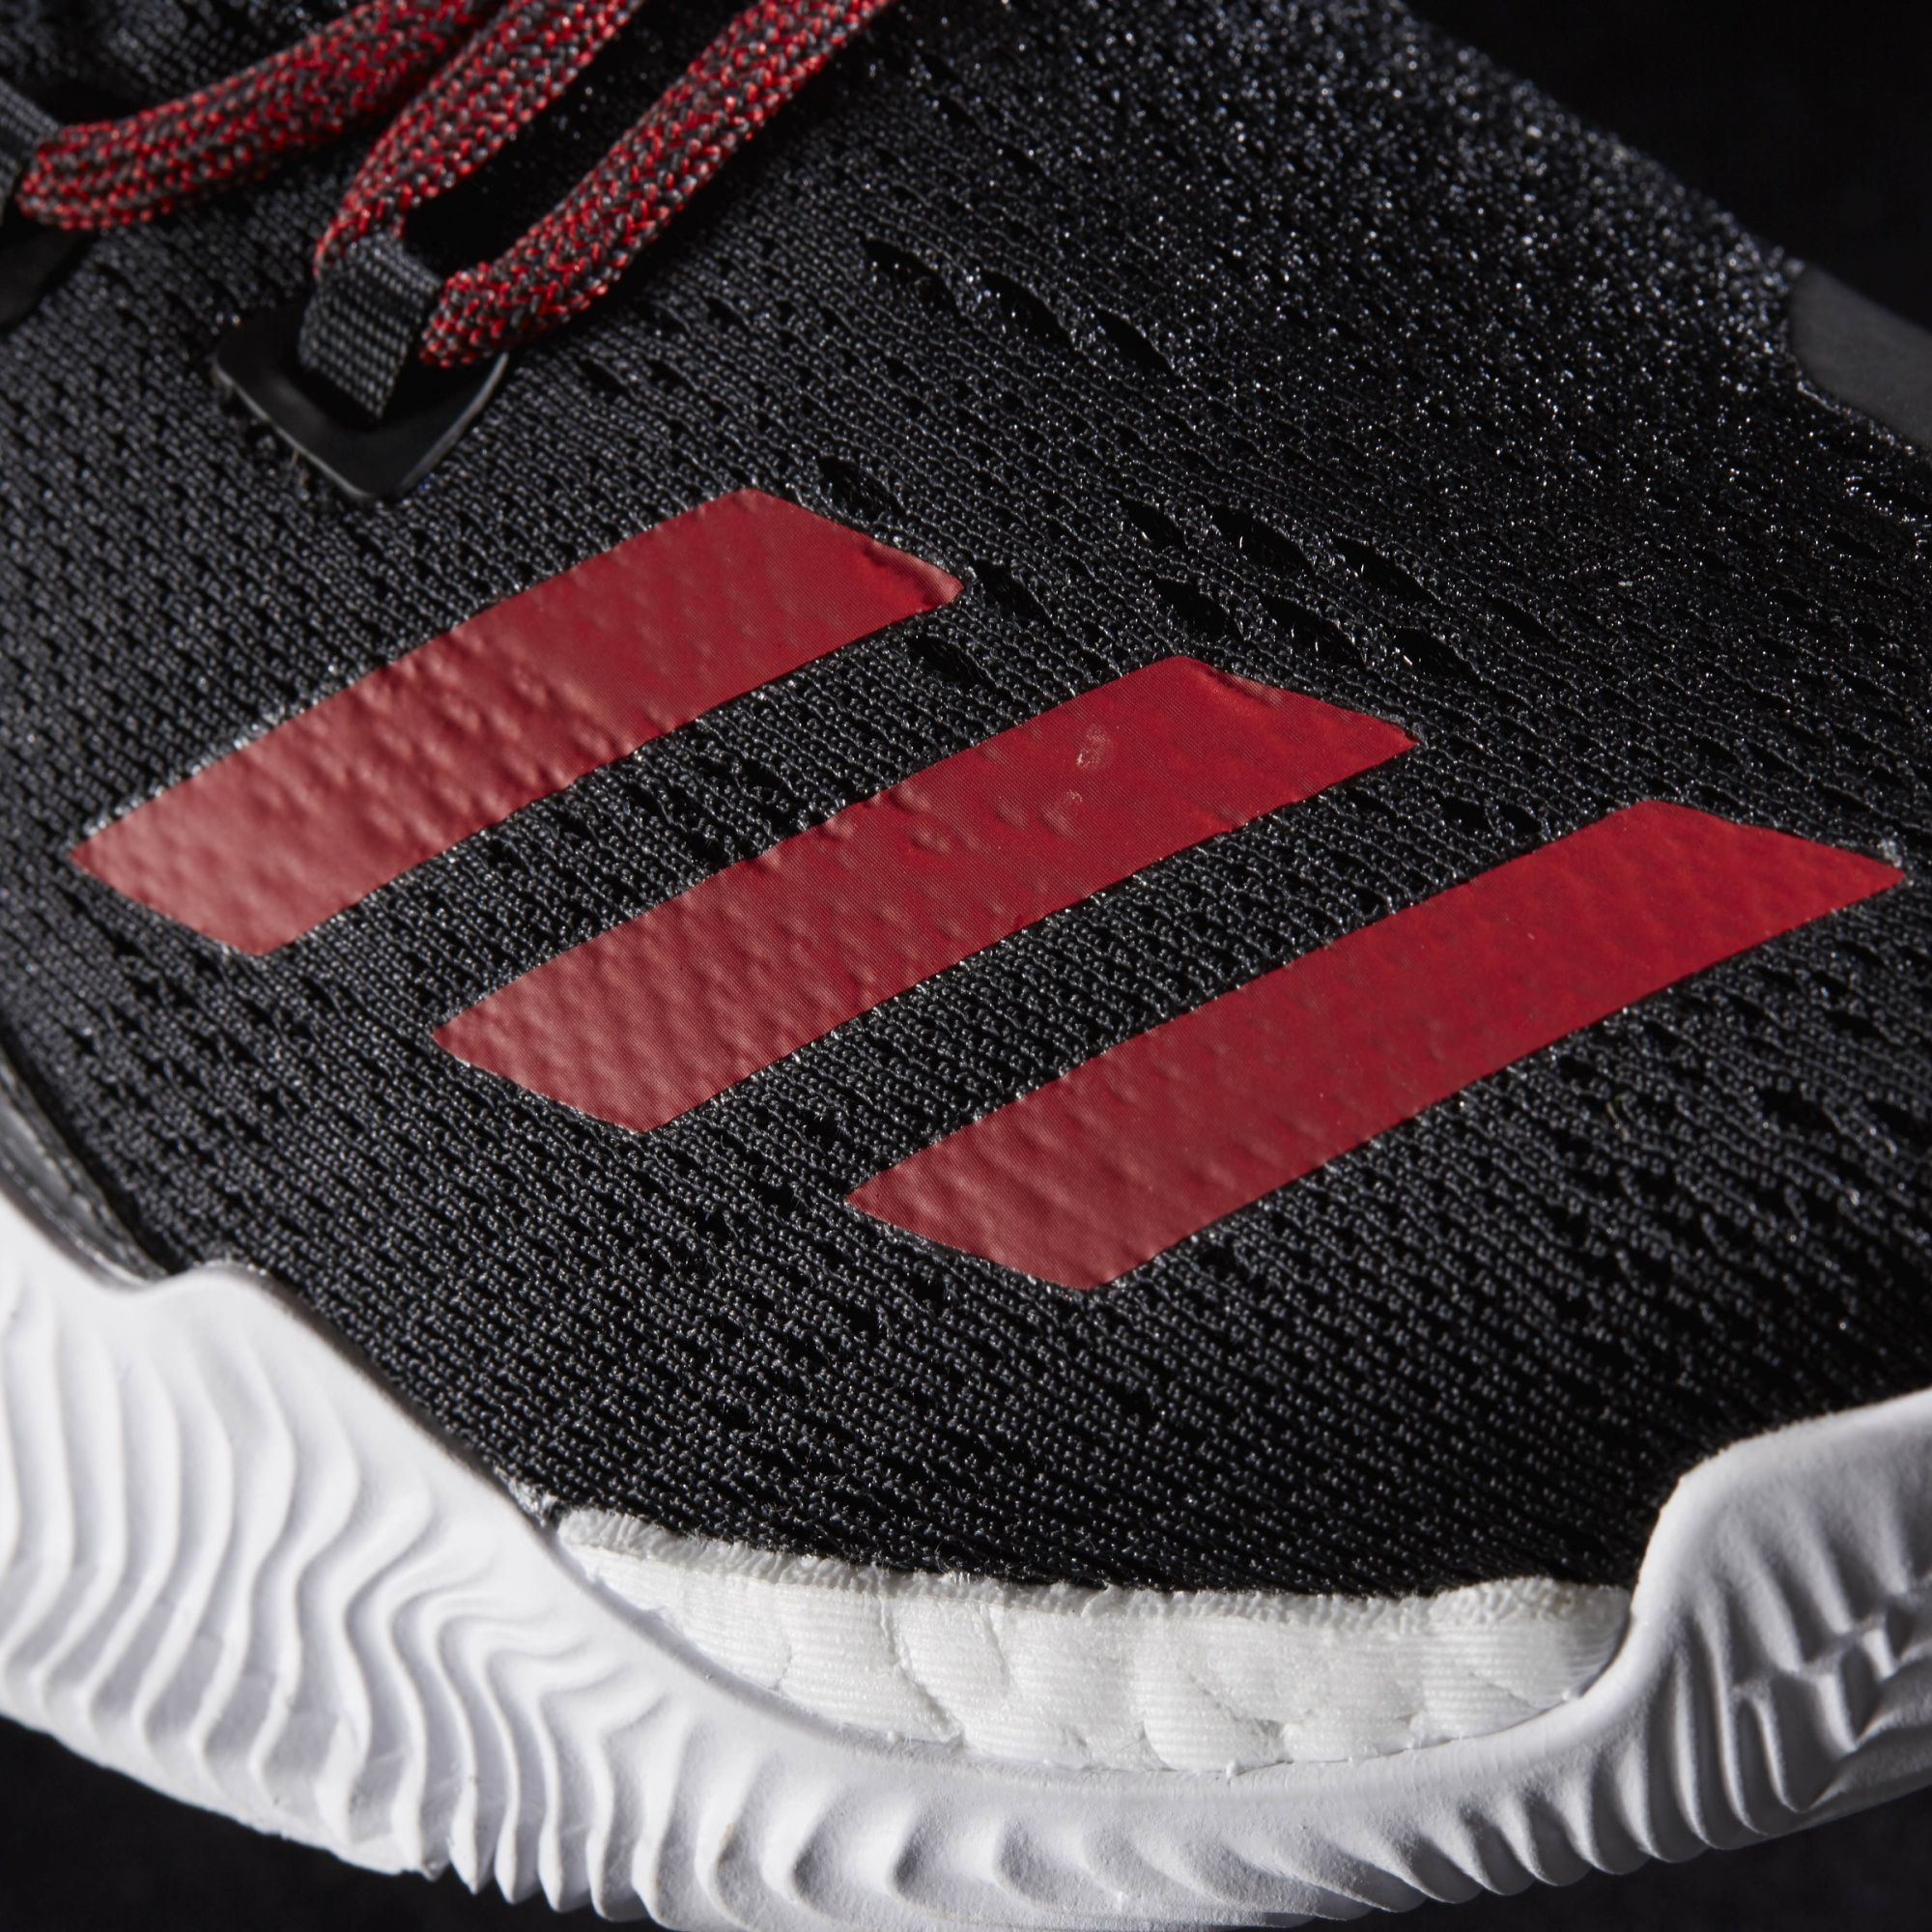 Nike Free Run+ 3 Shield 536840 003 Sneakersnstuff I